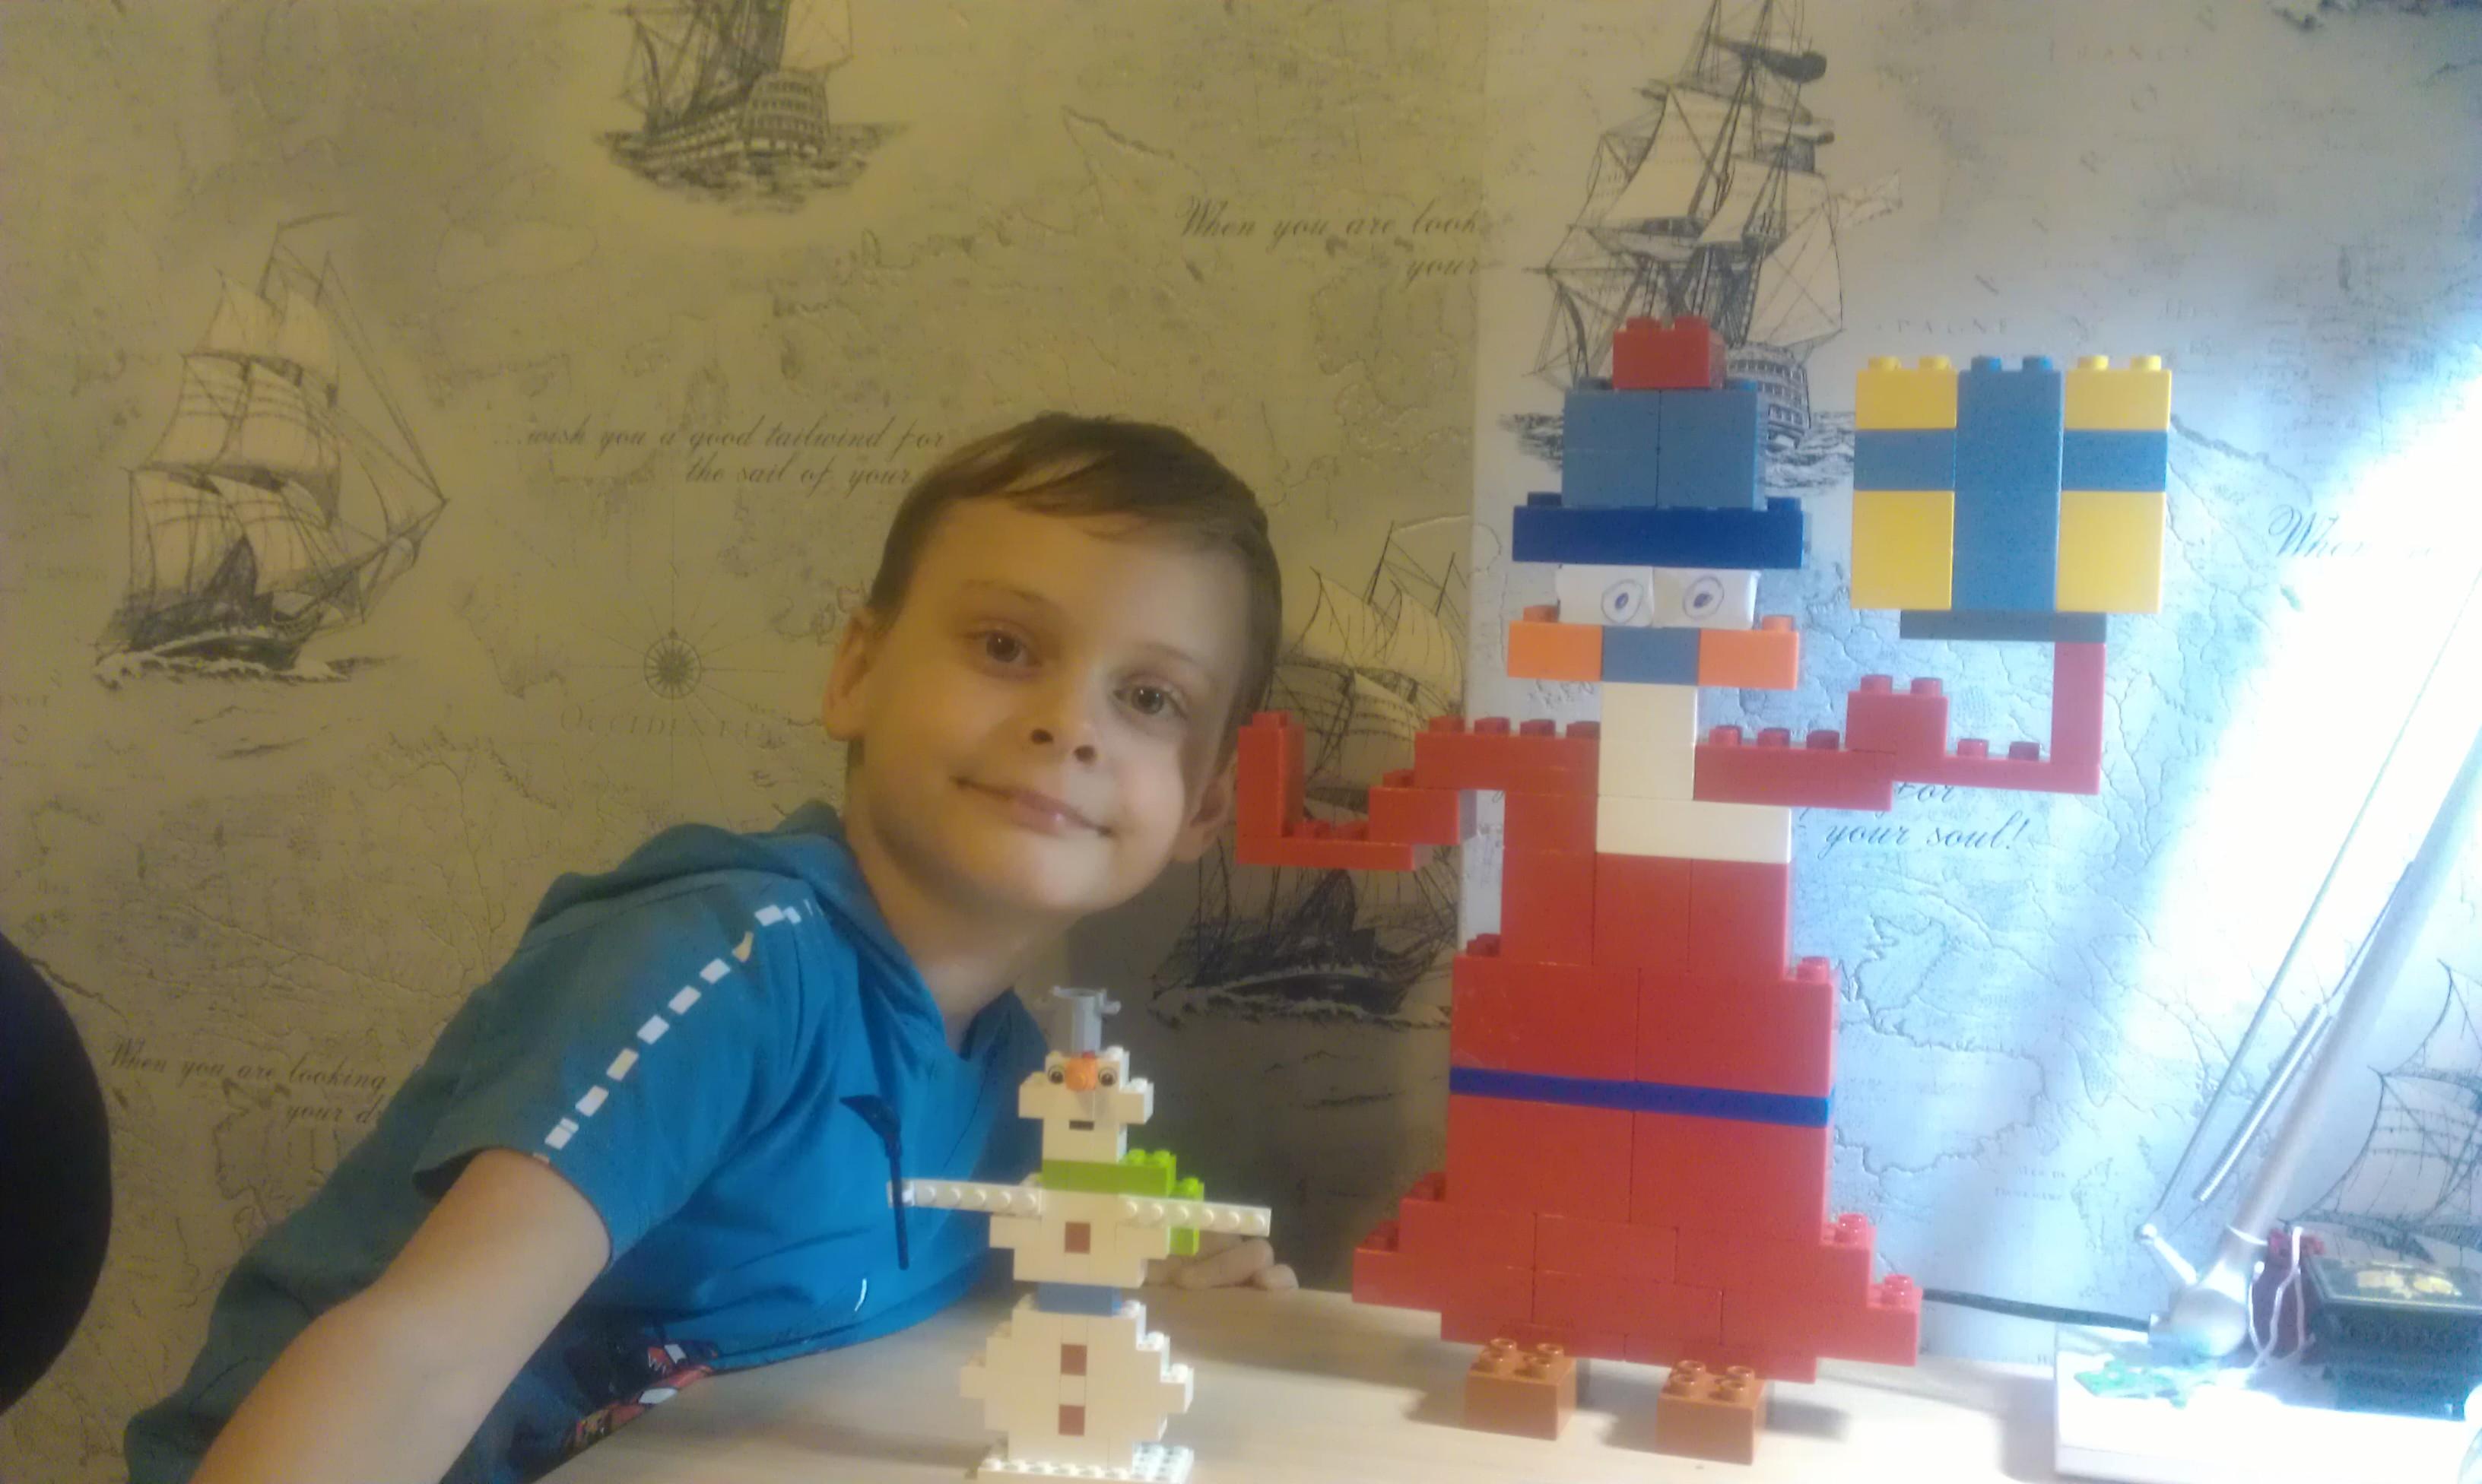 Дед Мороз-силач и снеговик из ЛЕГО. Наряди елку с LEGO